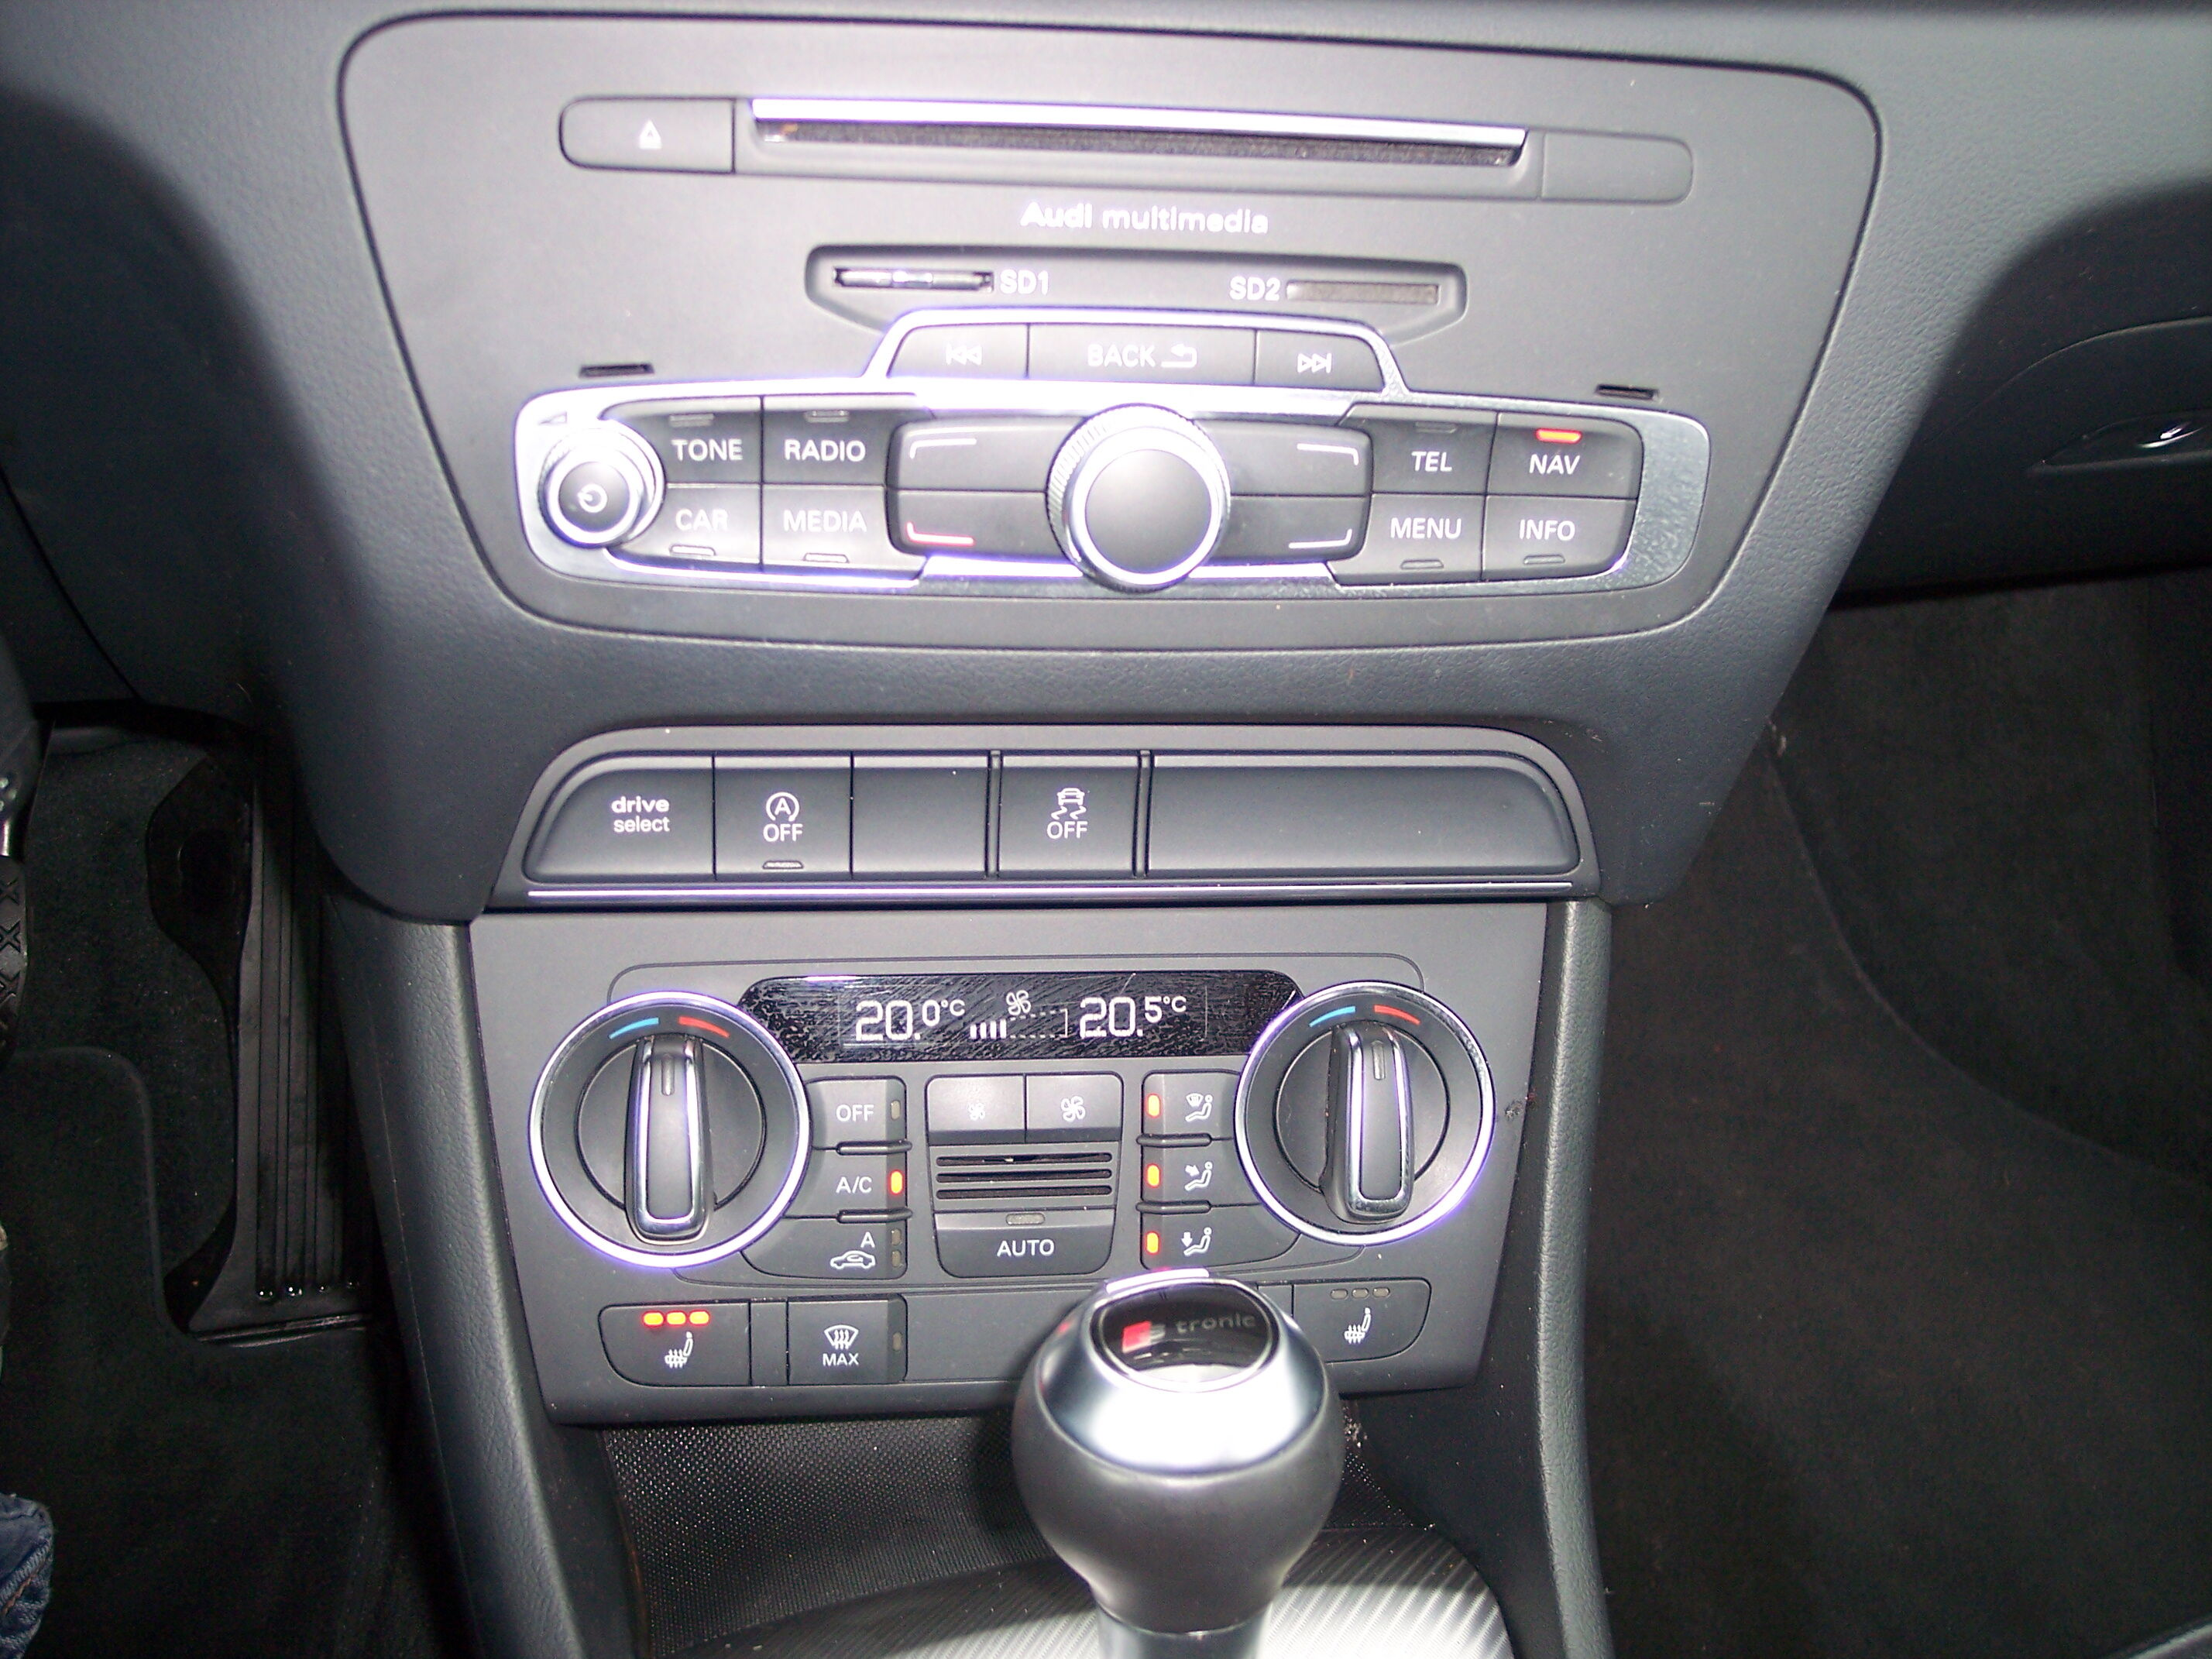 Audi Q3 - 2015 SUV AUTOMAAT 9/13